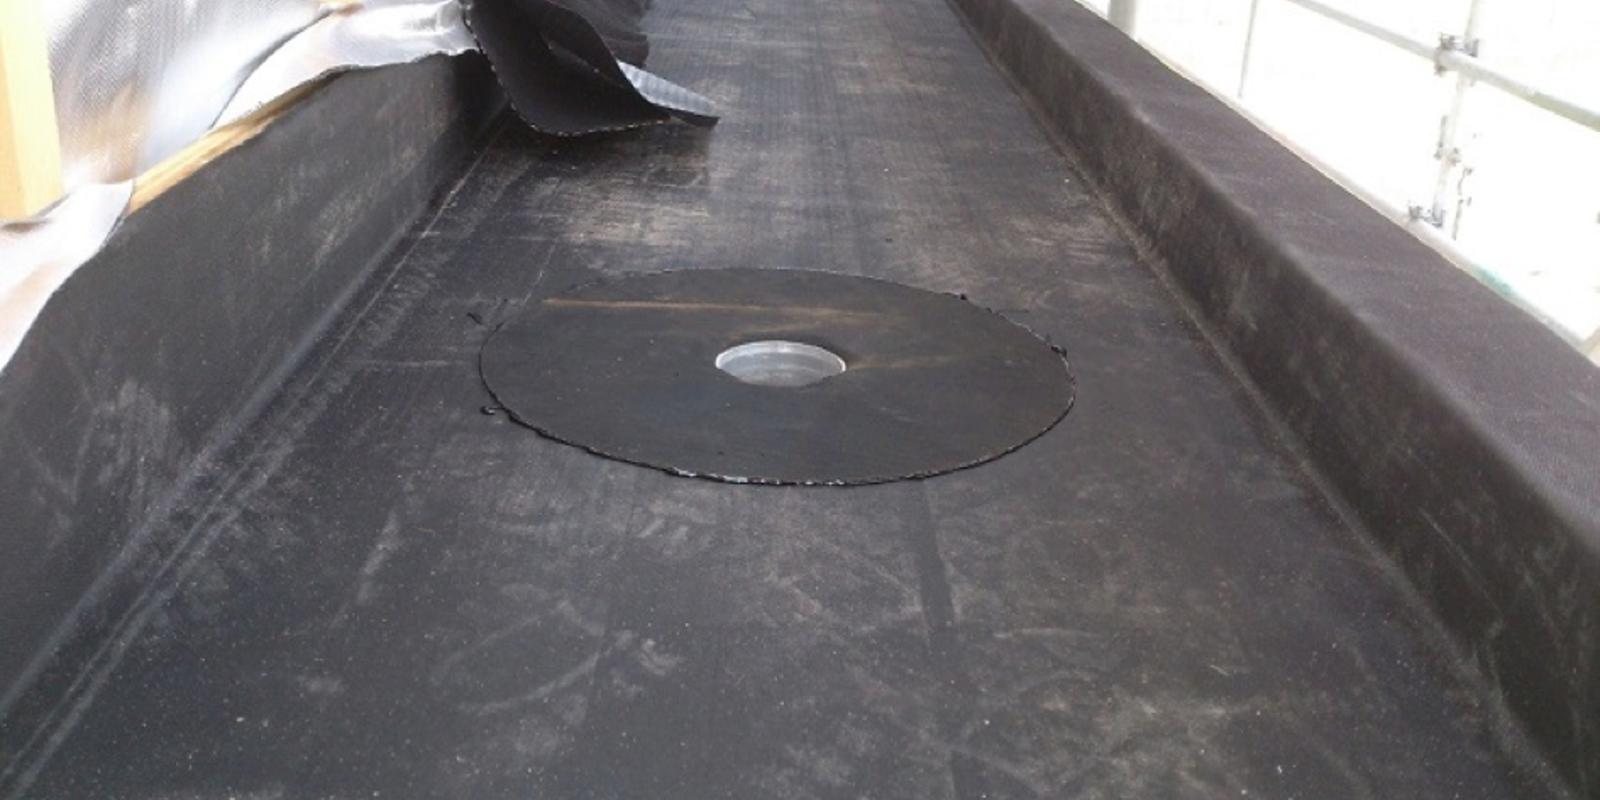 dak repareren met epdm